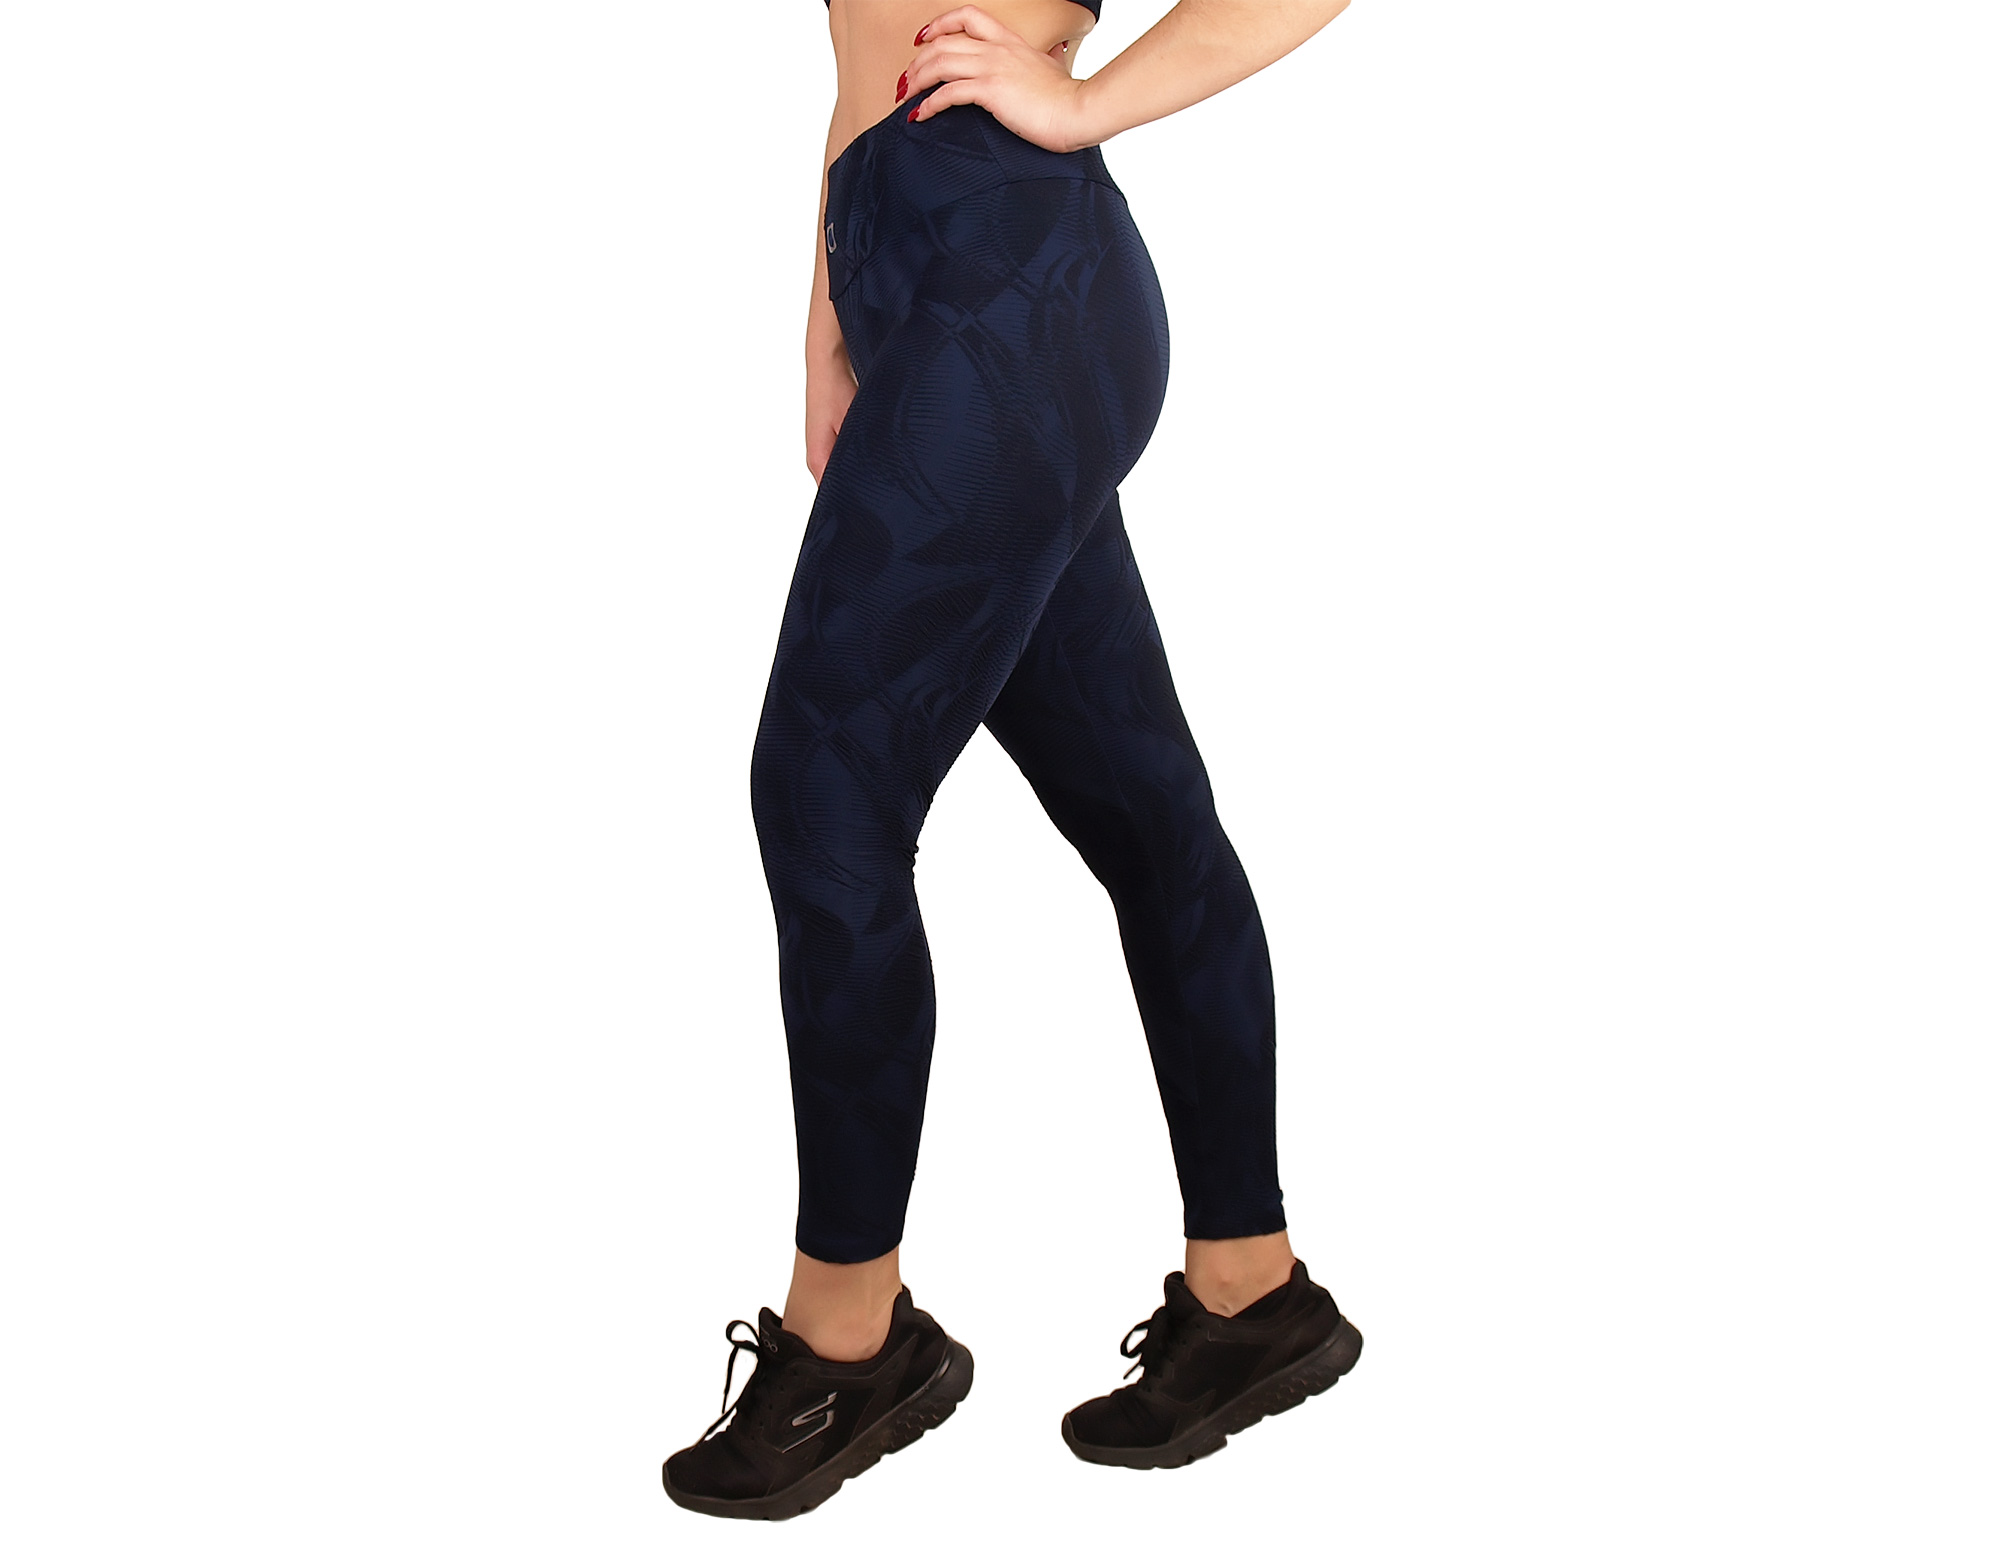 Legging mujer sport cintura alta efecto textura